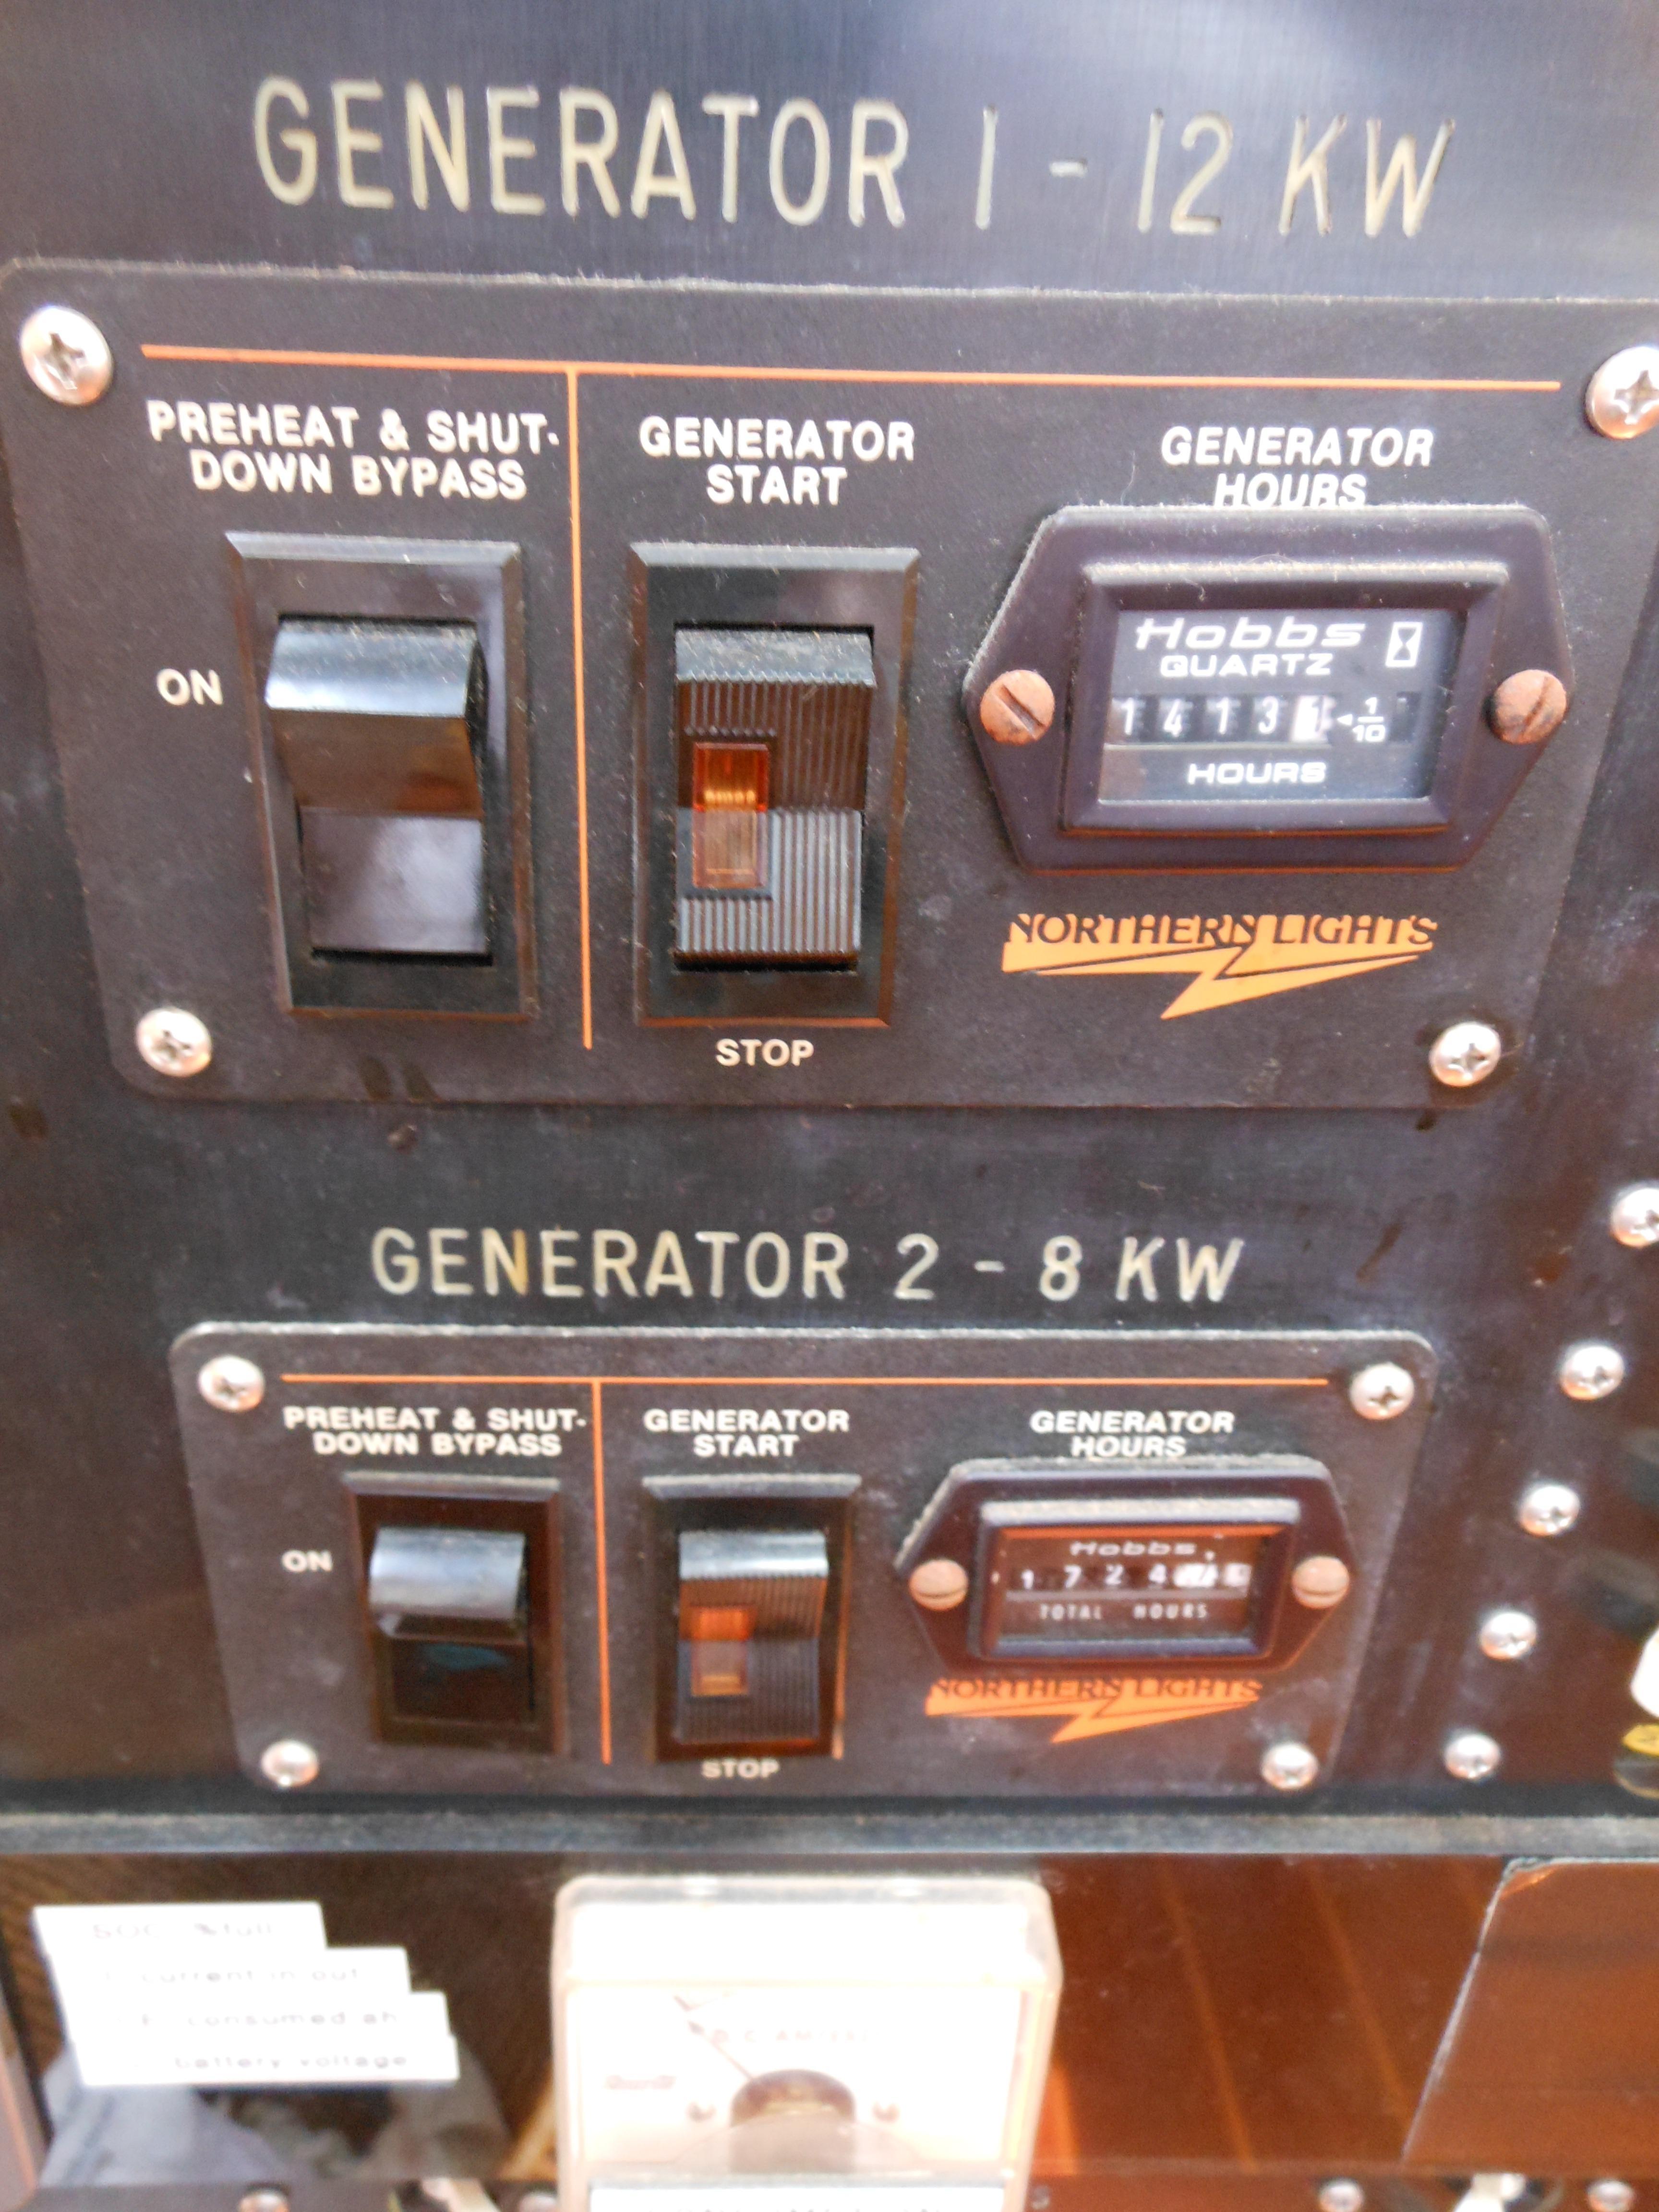 57 Wellington 2- generators 12kw - 8kw